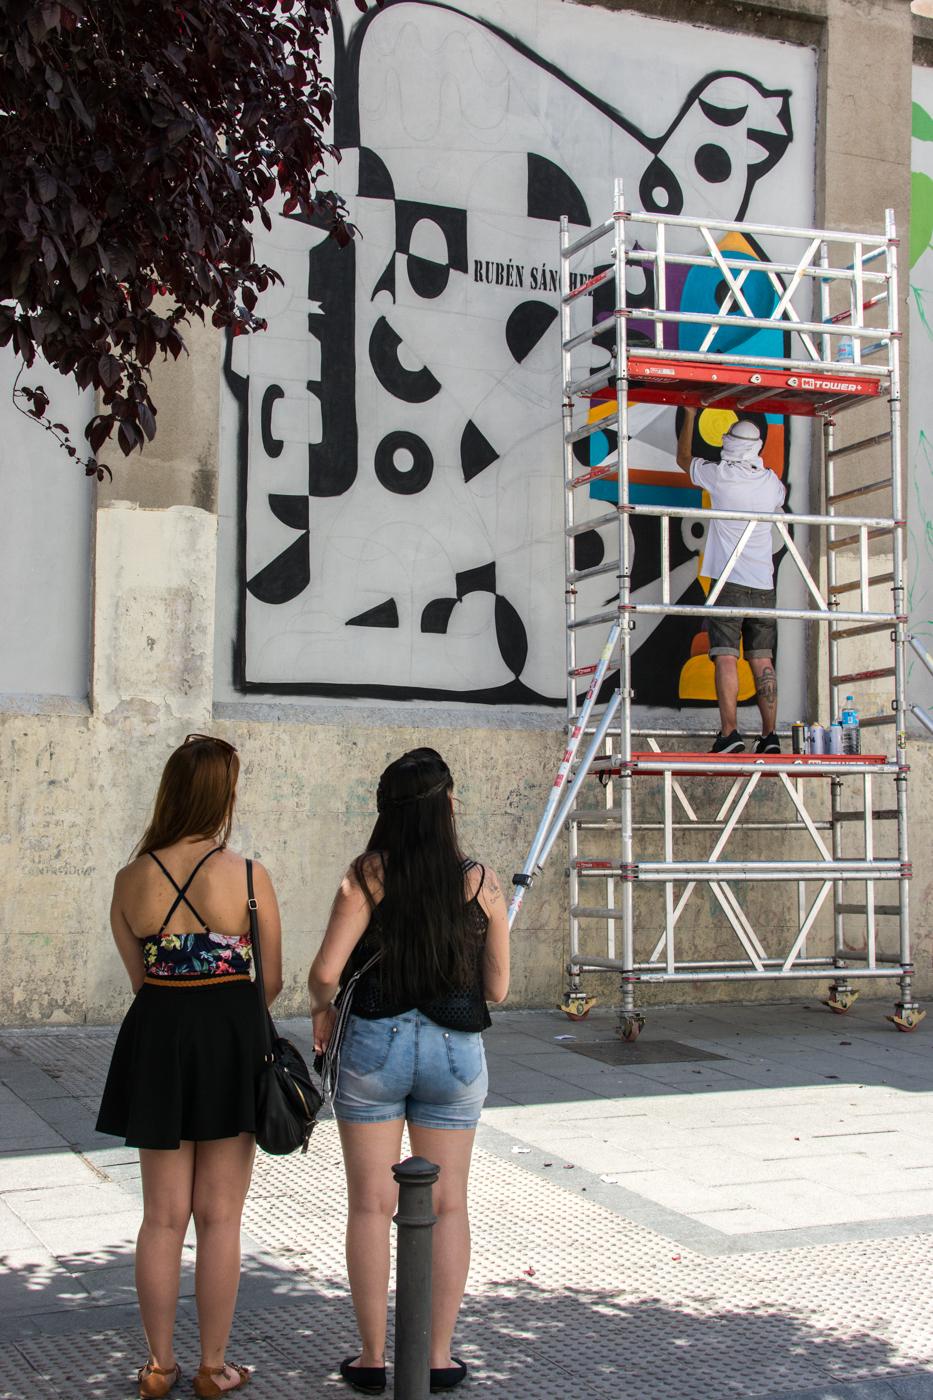 muros2016_martes-0891.jpg